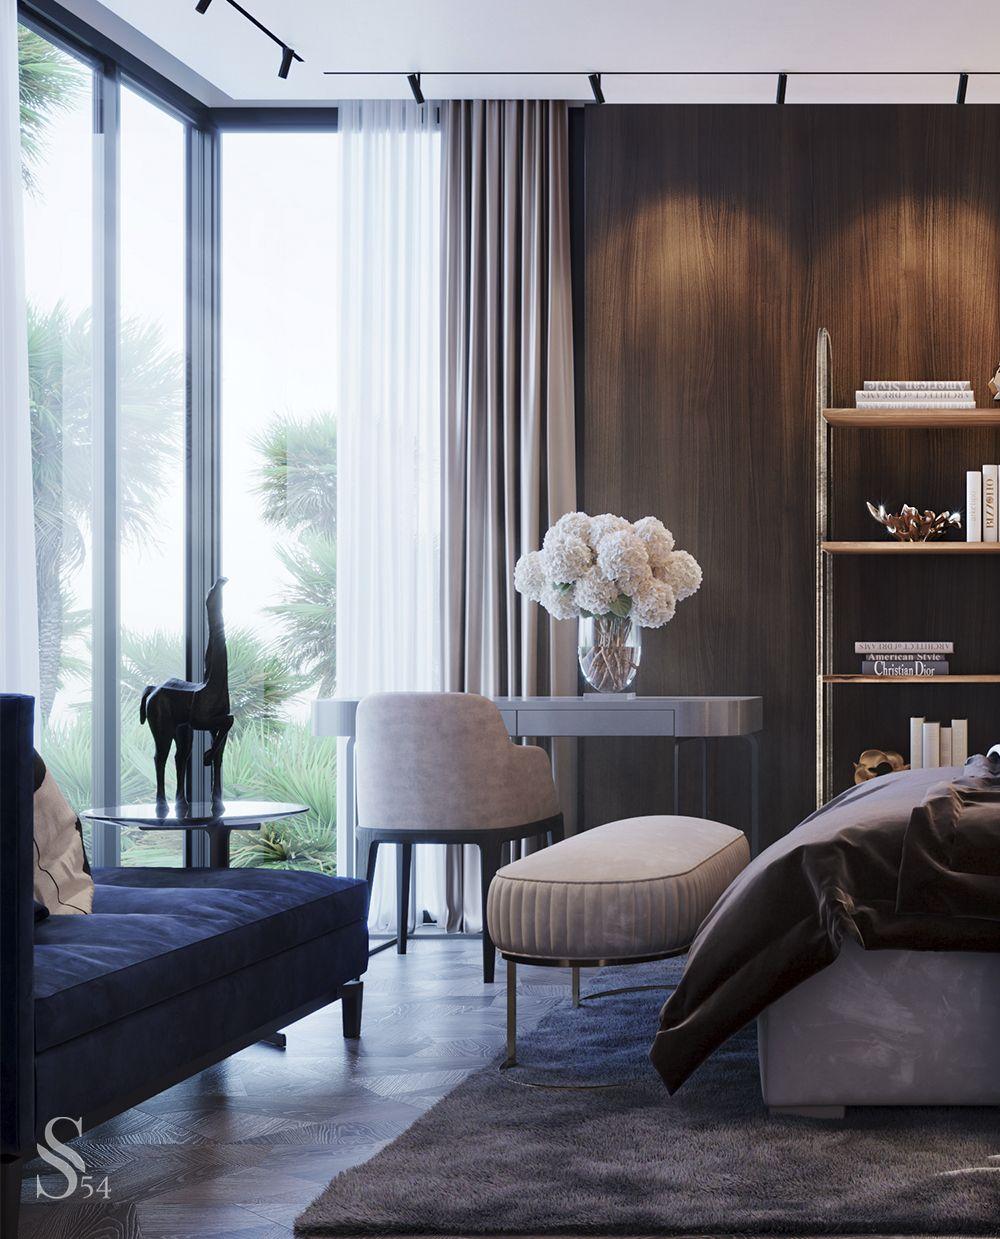 Guest Bedroom Contemporary Home Decor Luxury Home Decor Interior Design